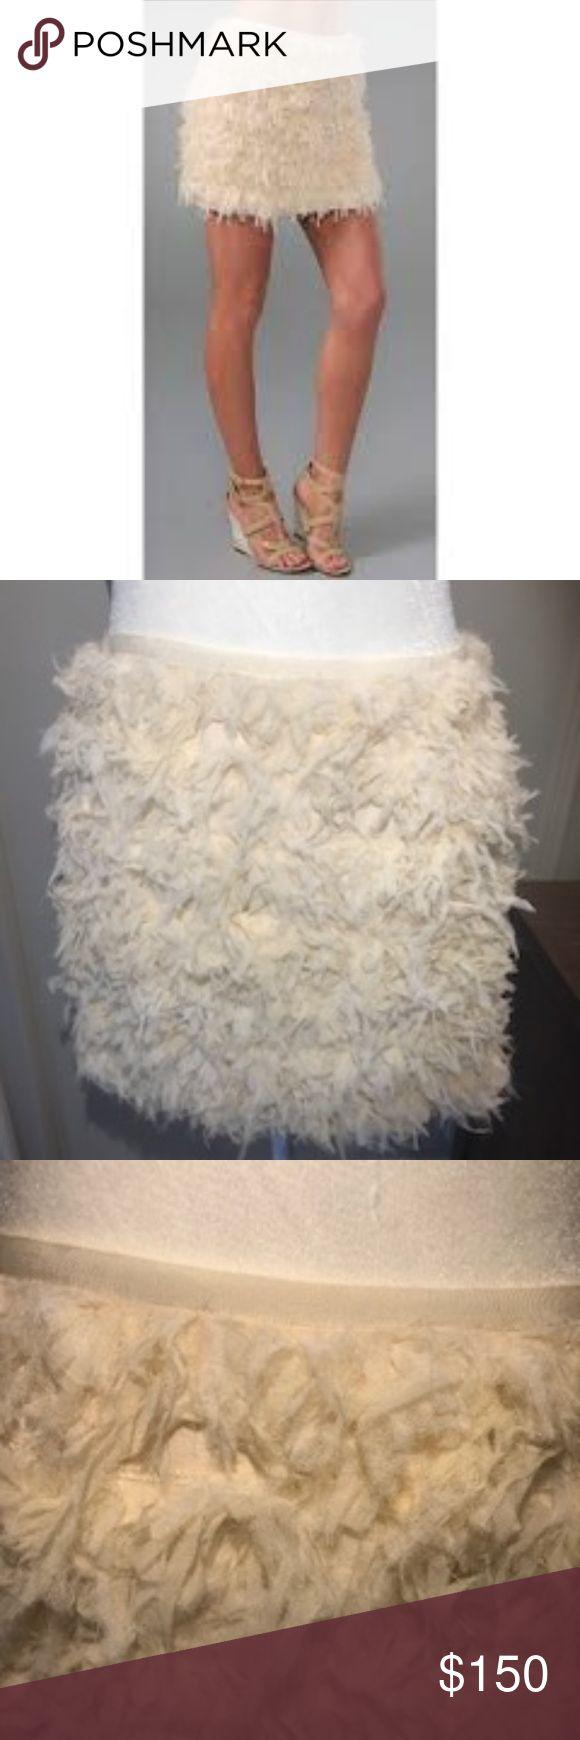 "NWT Diane Von Furstenberg Ivory Chiffon Mini Skirt NWT Diane Von Furstenberg Ivory/Cream Chiffon Mini Skirt ""Postage Stamp Mini"" Elastic Waist Fully Lined Hand Cut Chiffon Fringe Size 4 Diane von Furstenberg Skirts Mini"